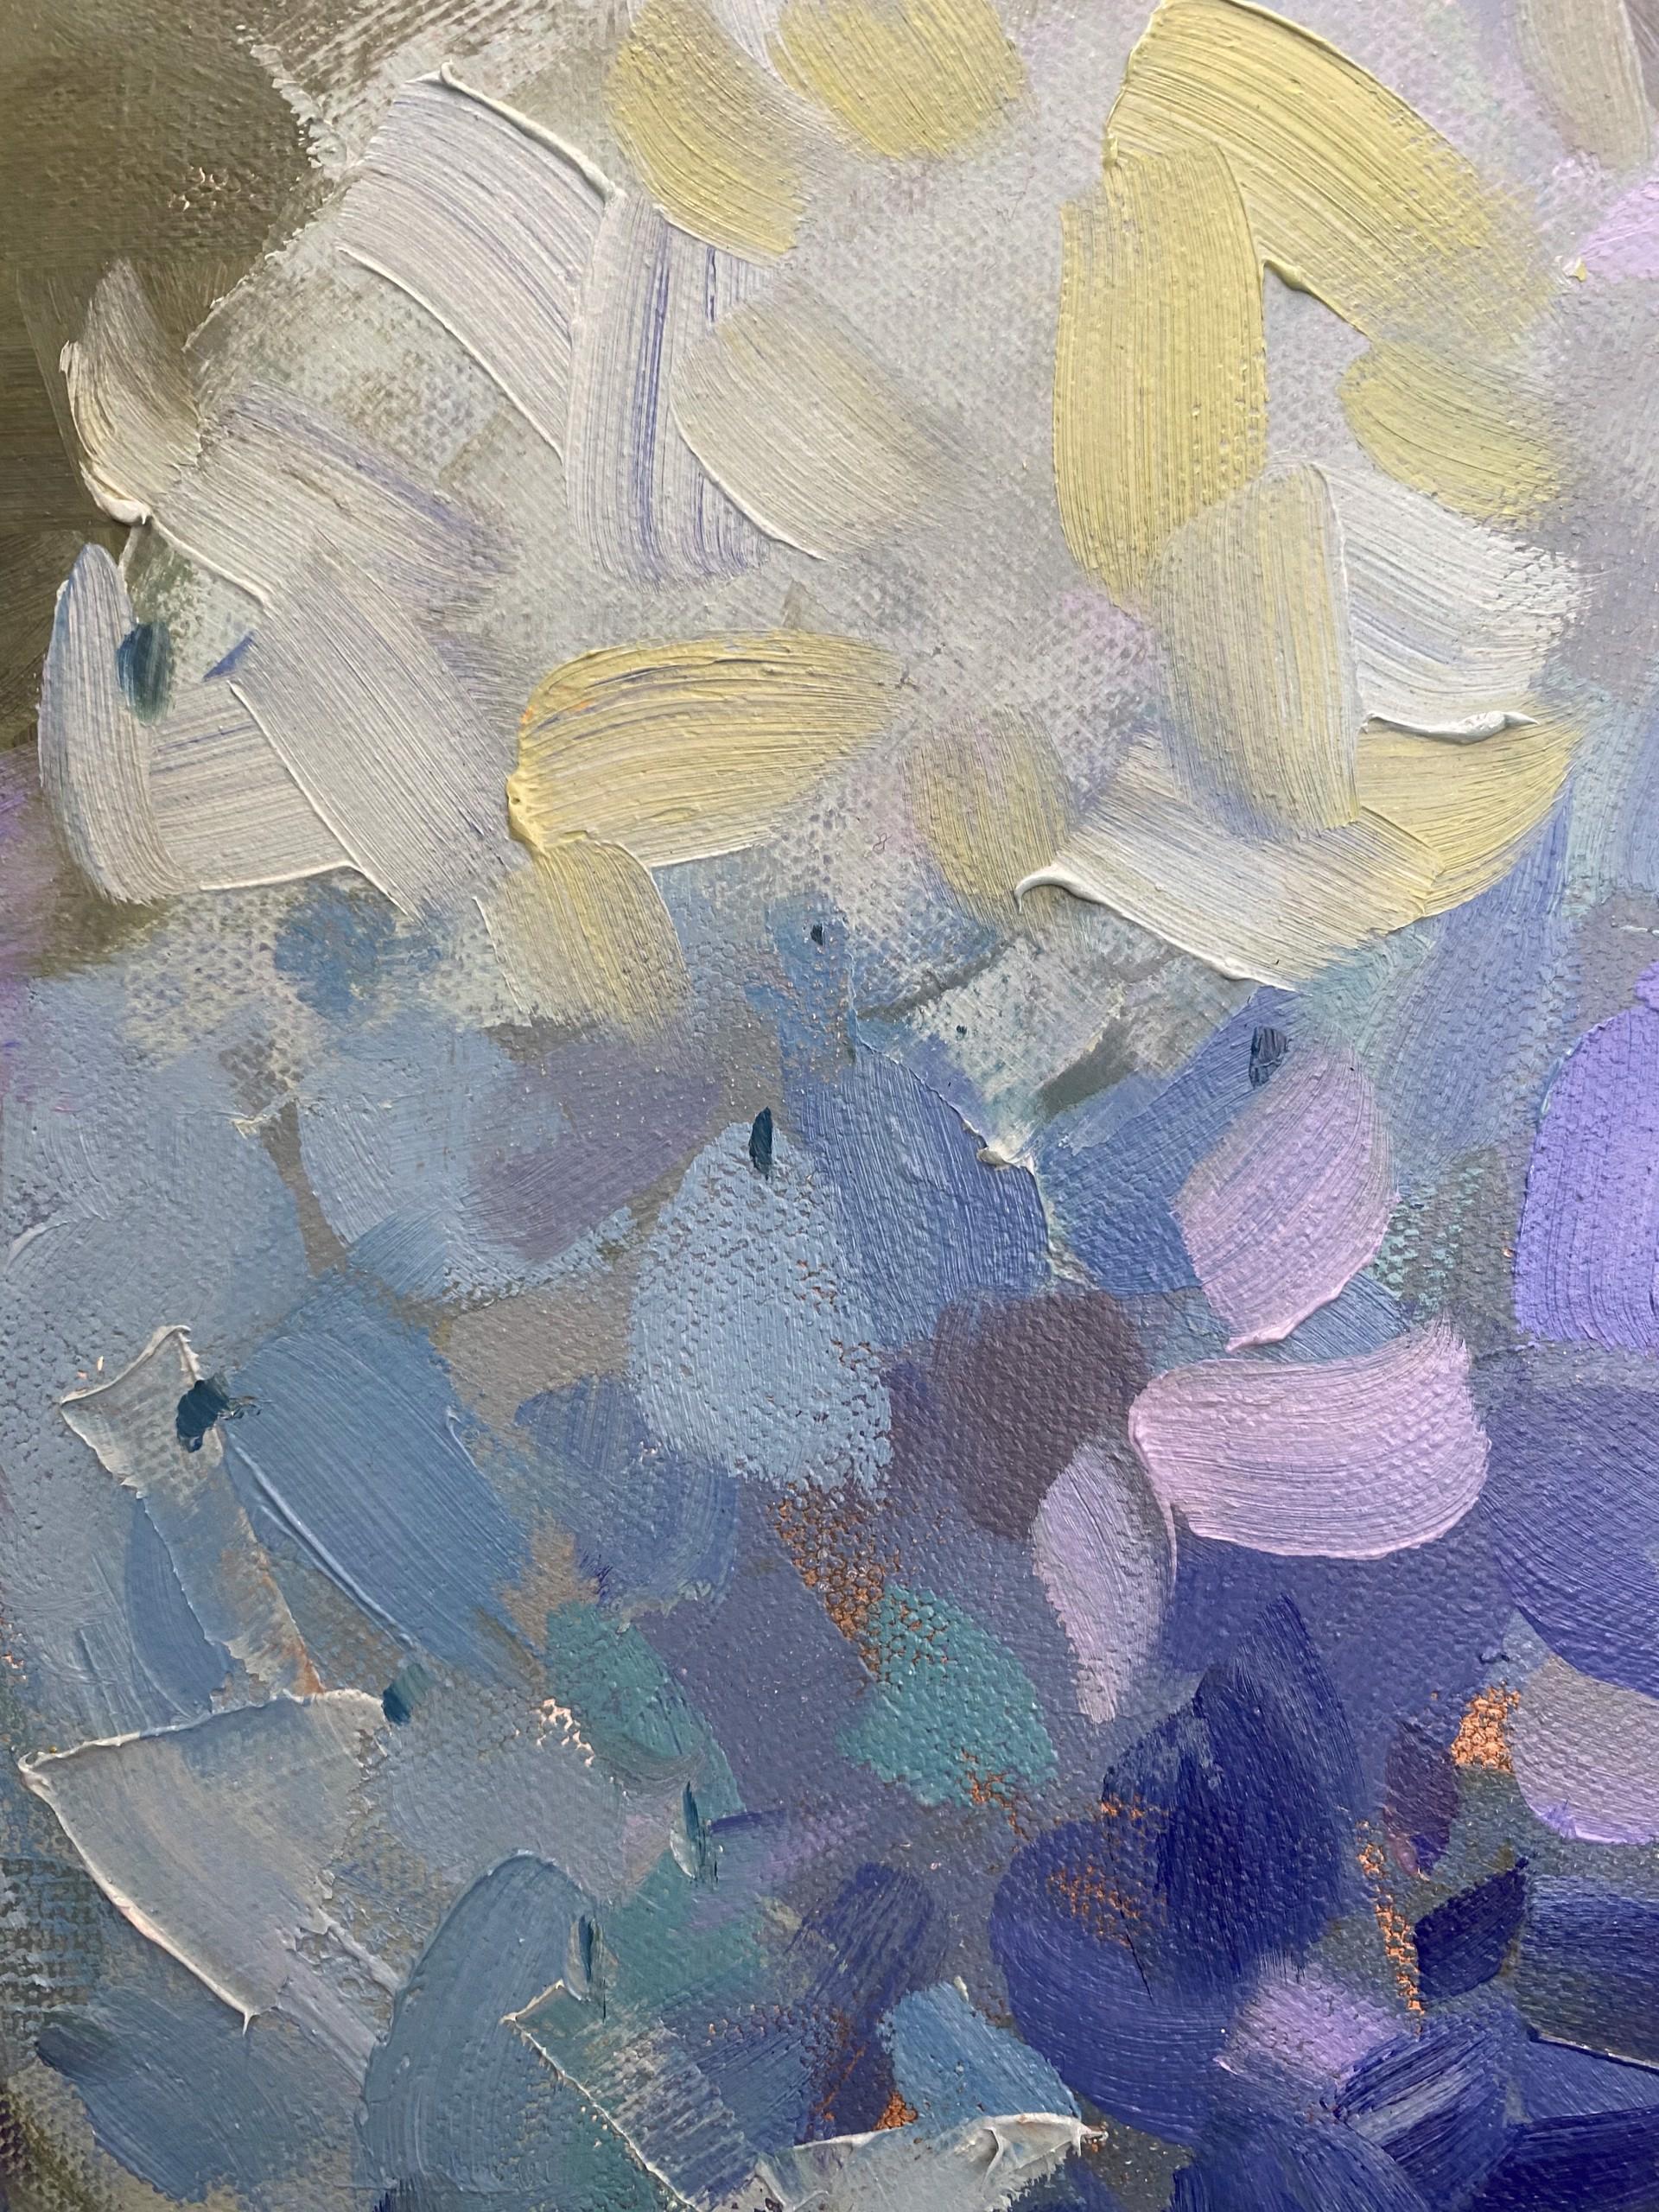 Petal Confetti, II by Marissa Vogl